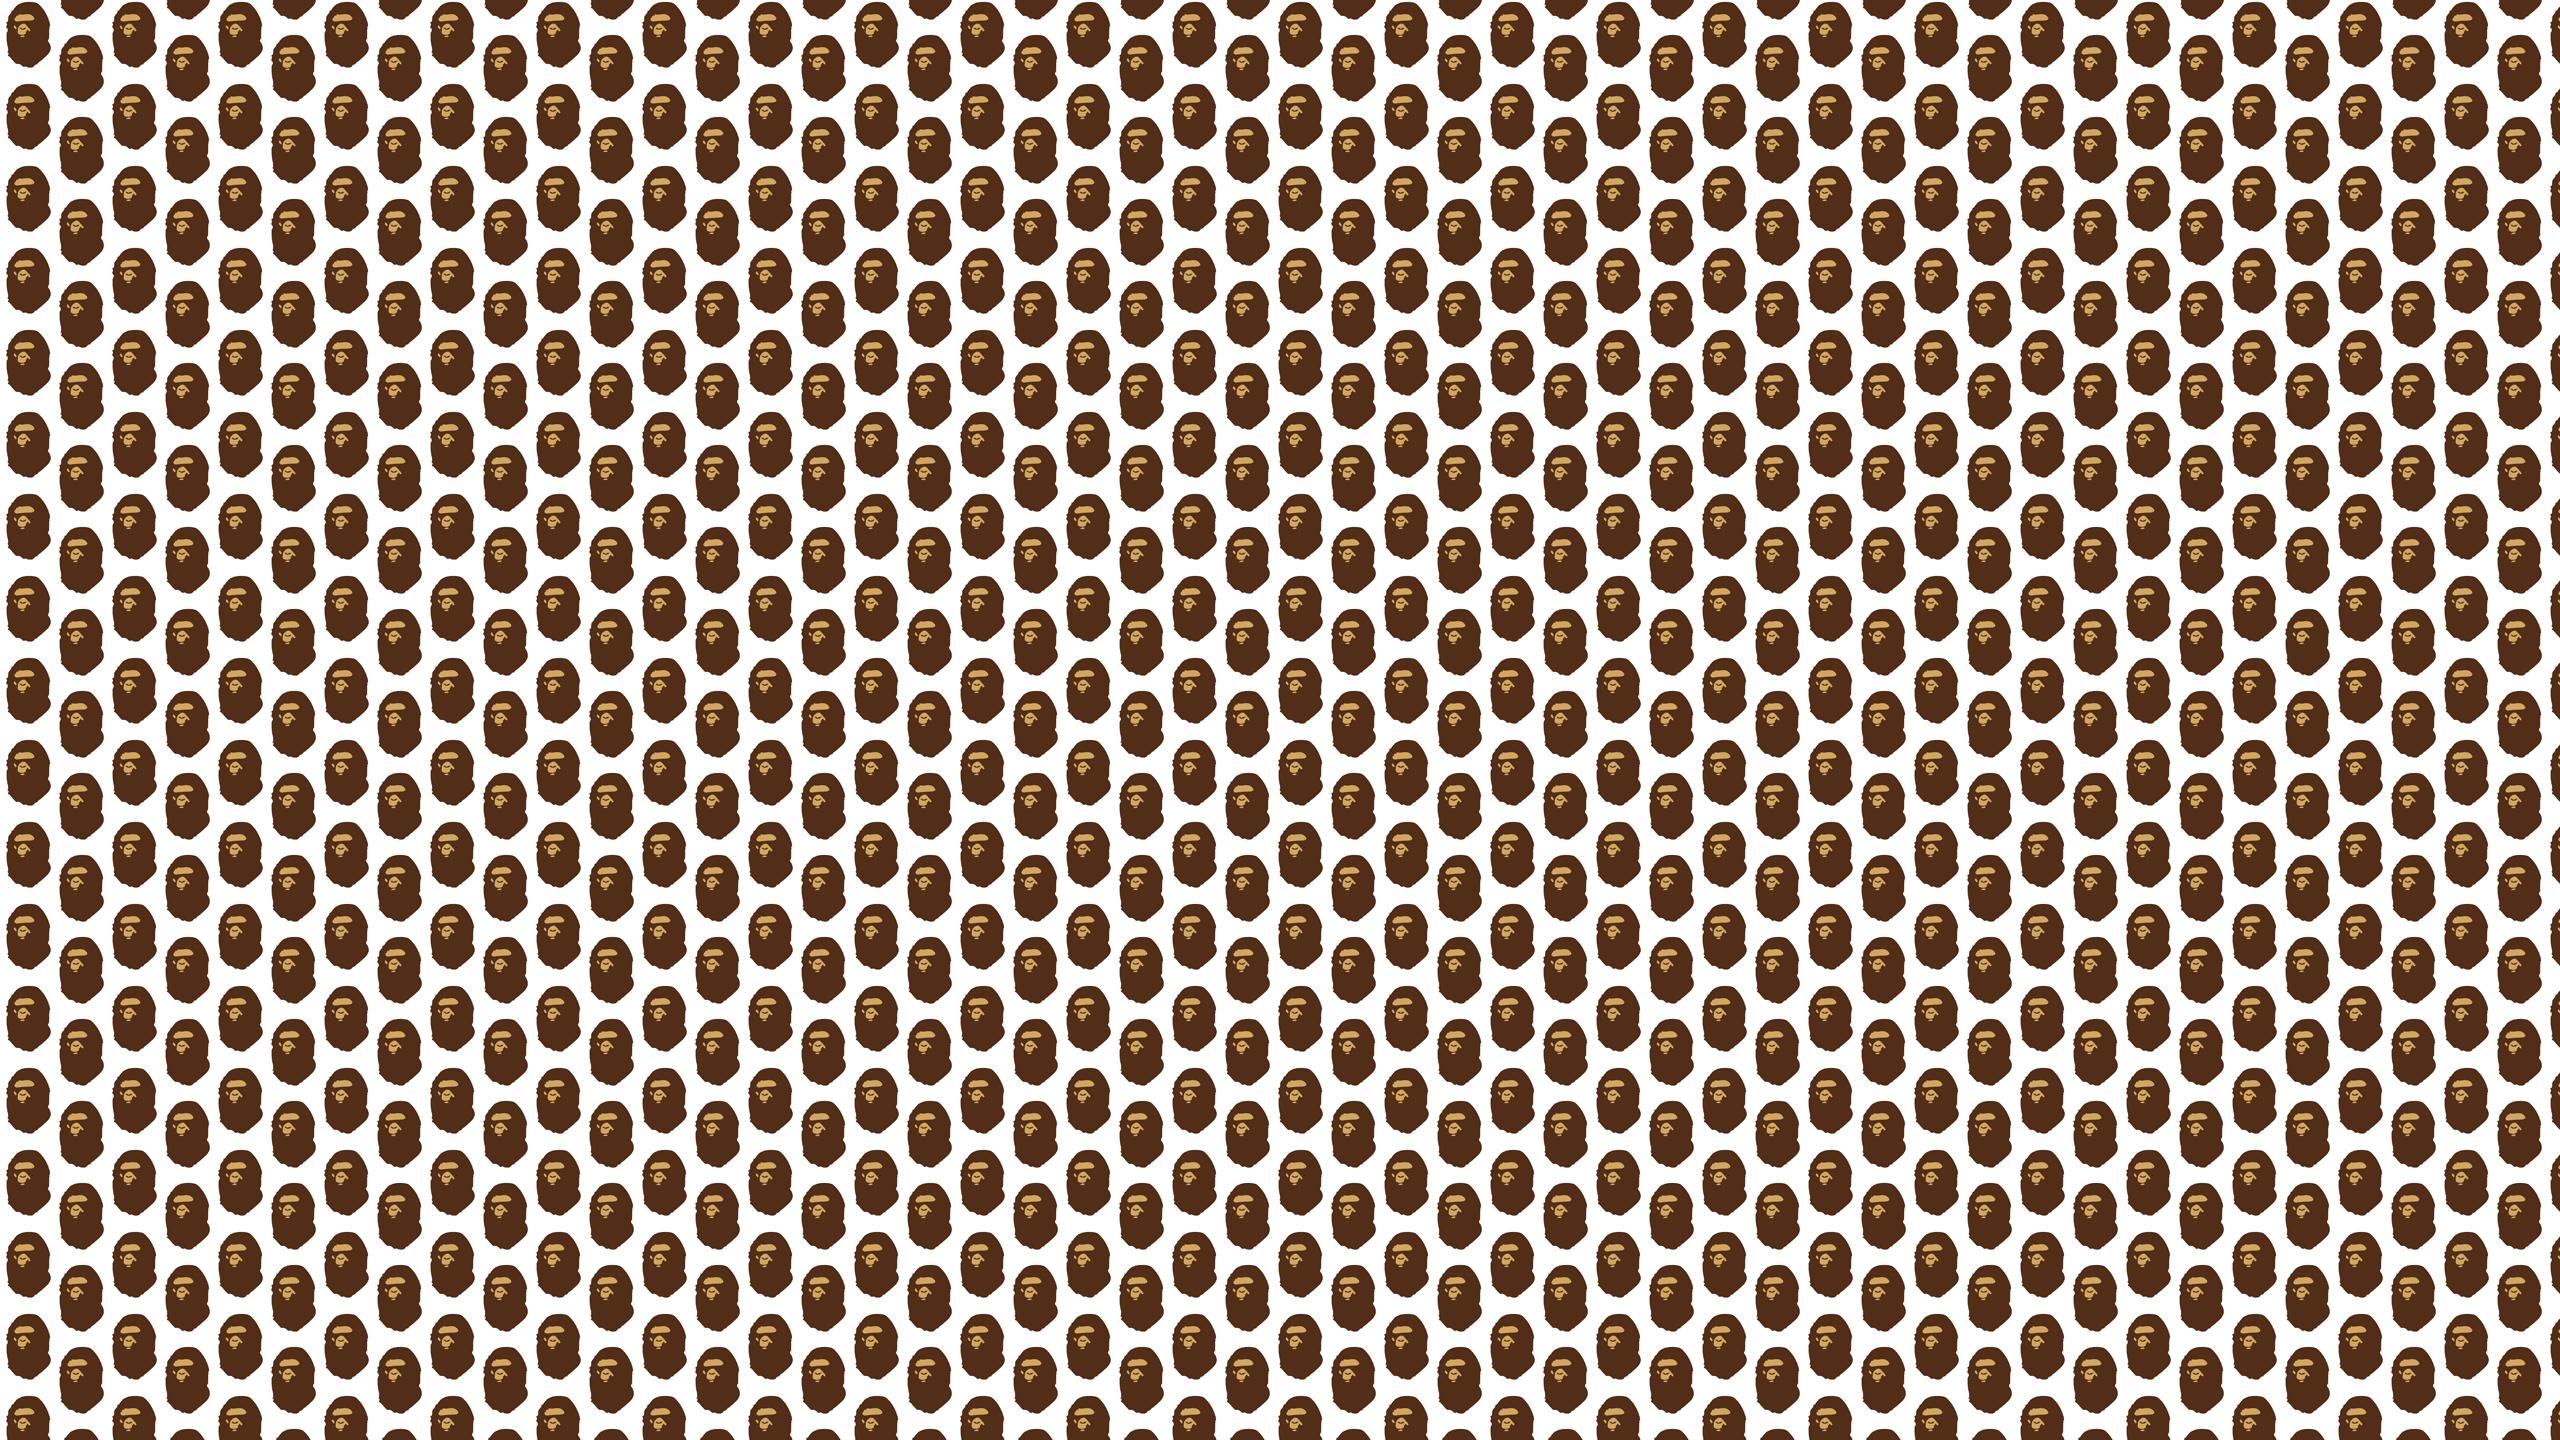 A bathing ape wallpapers wallpaper cave bape shark d bathing ape 2560x1440 222413 bape shark wallpaper voltagebd Choice Image